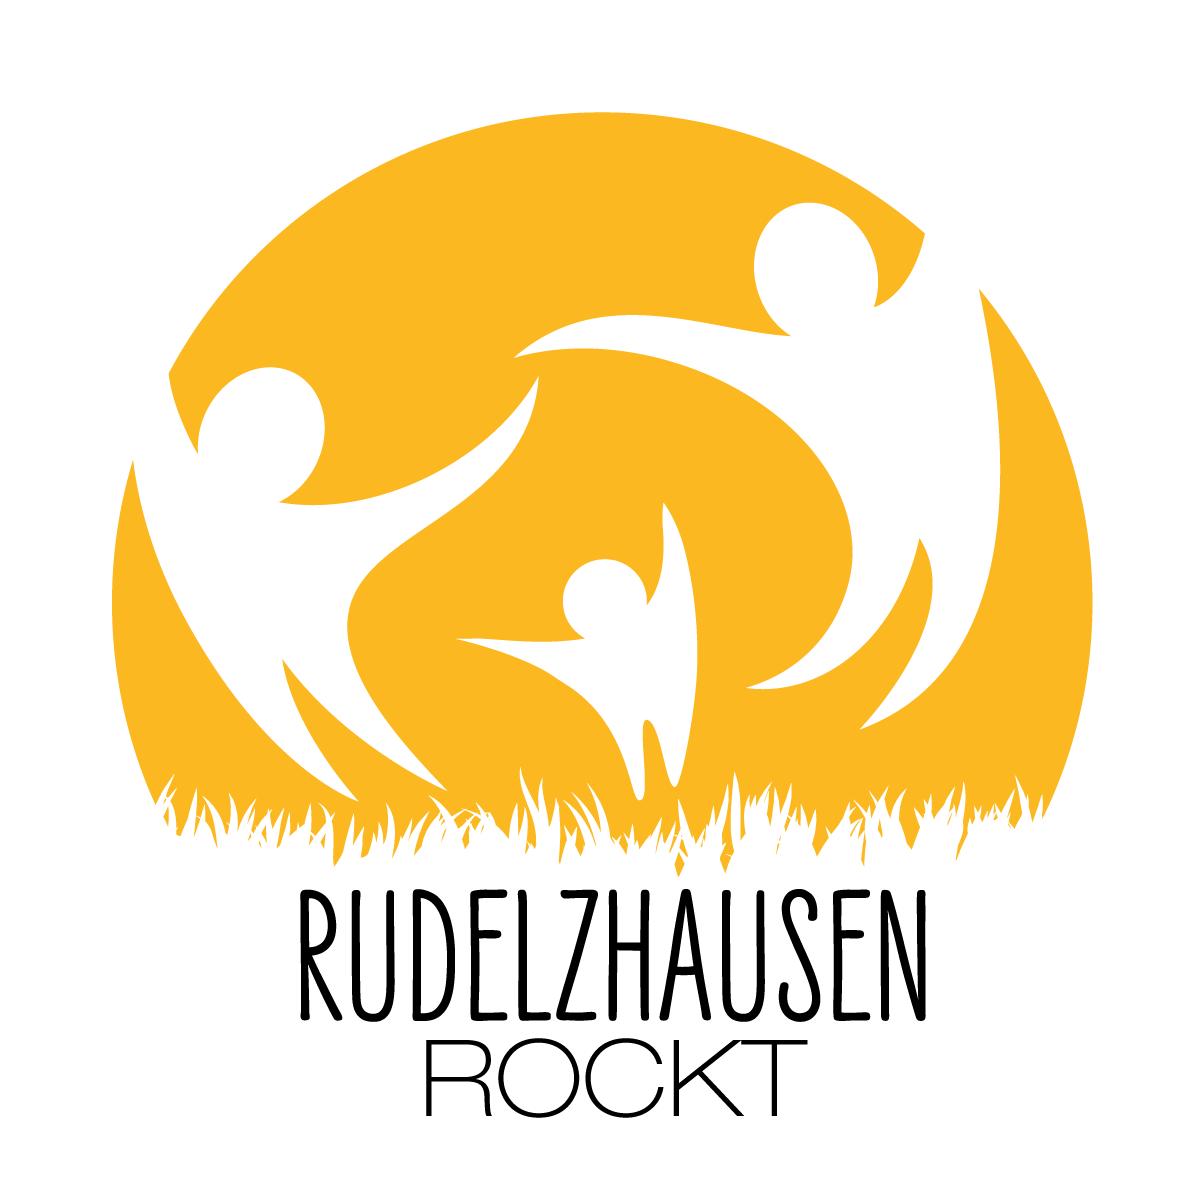 Rudelzhausen rockt